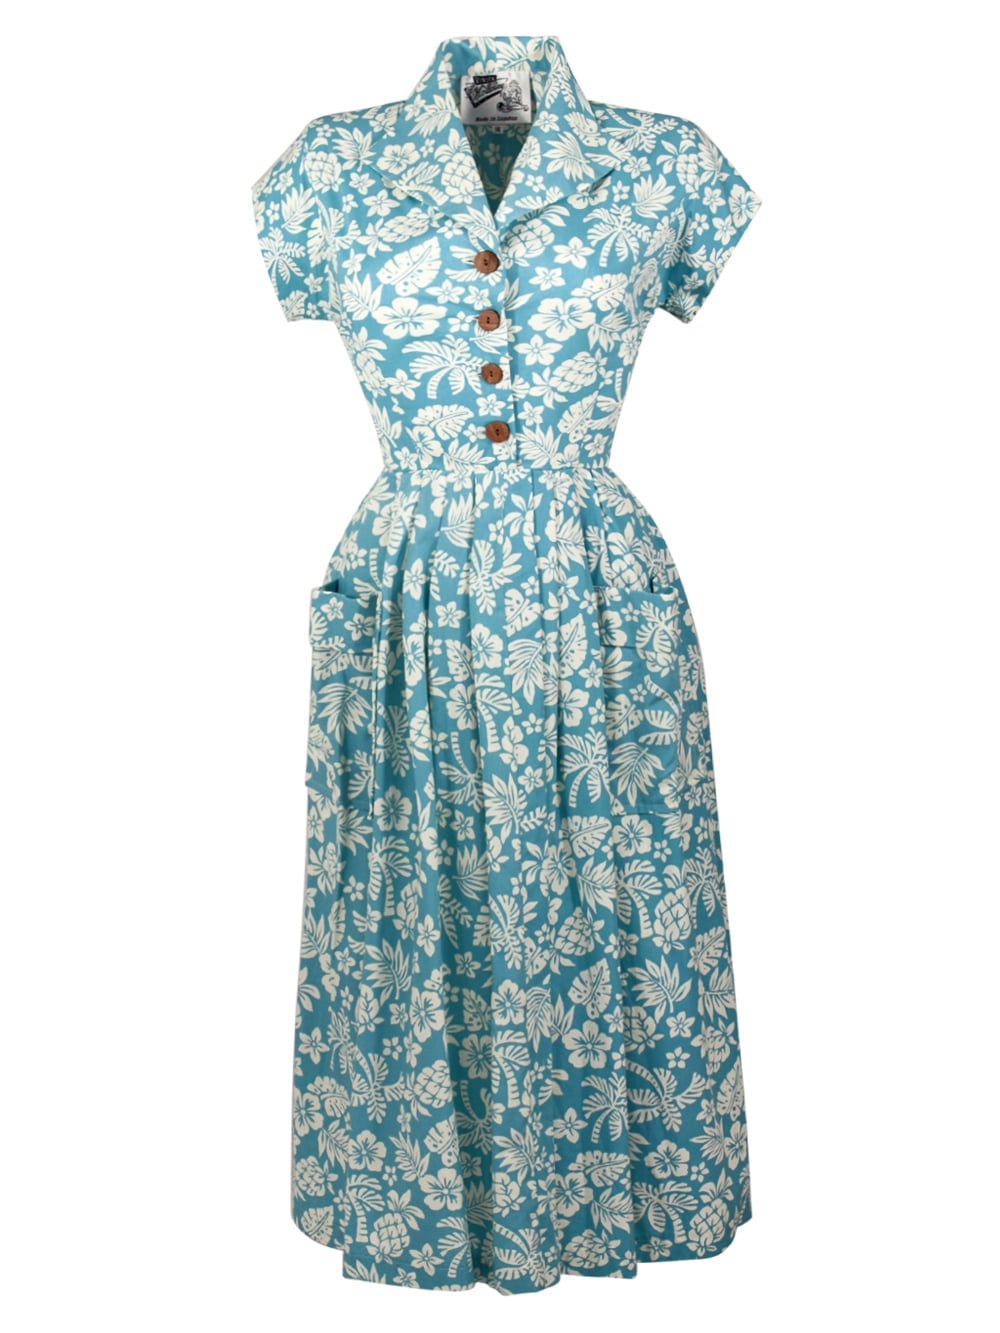 477716b46cbec Kitty Dress Pineapple Baby Blue from Vivien of Holloway